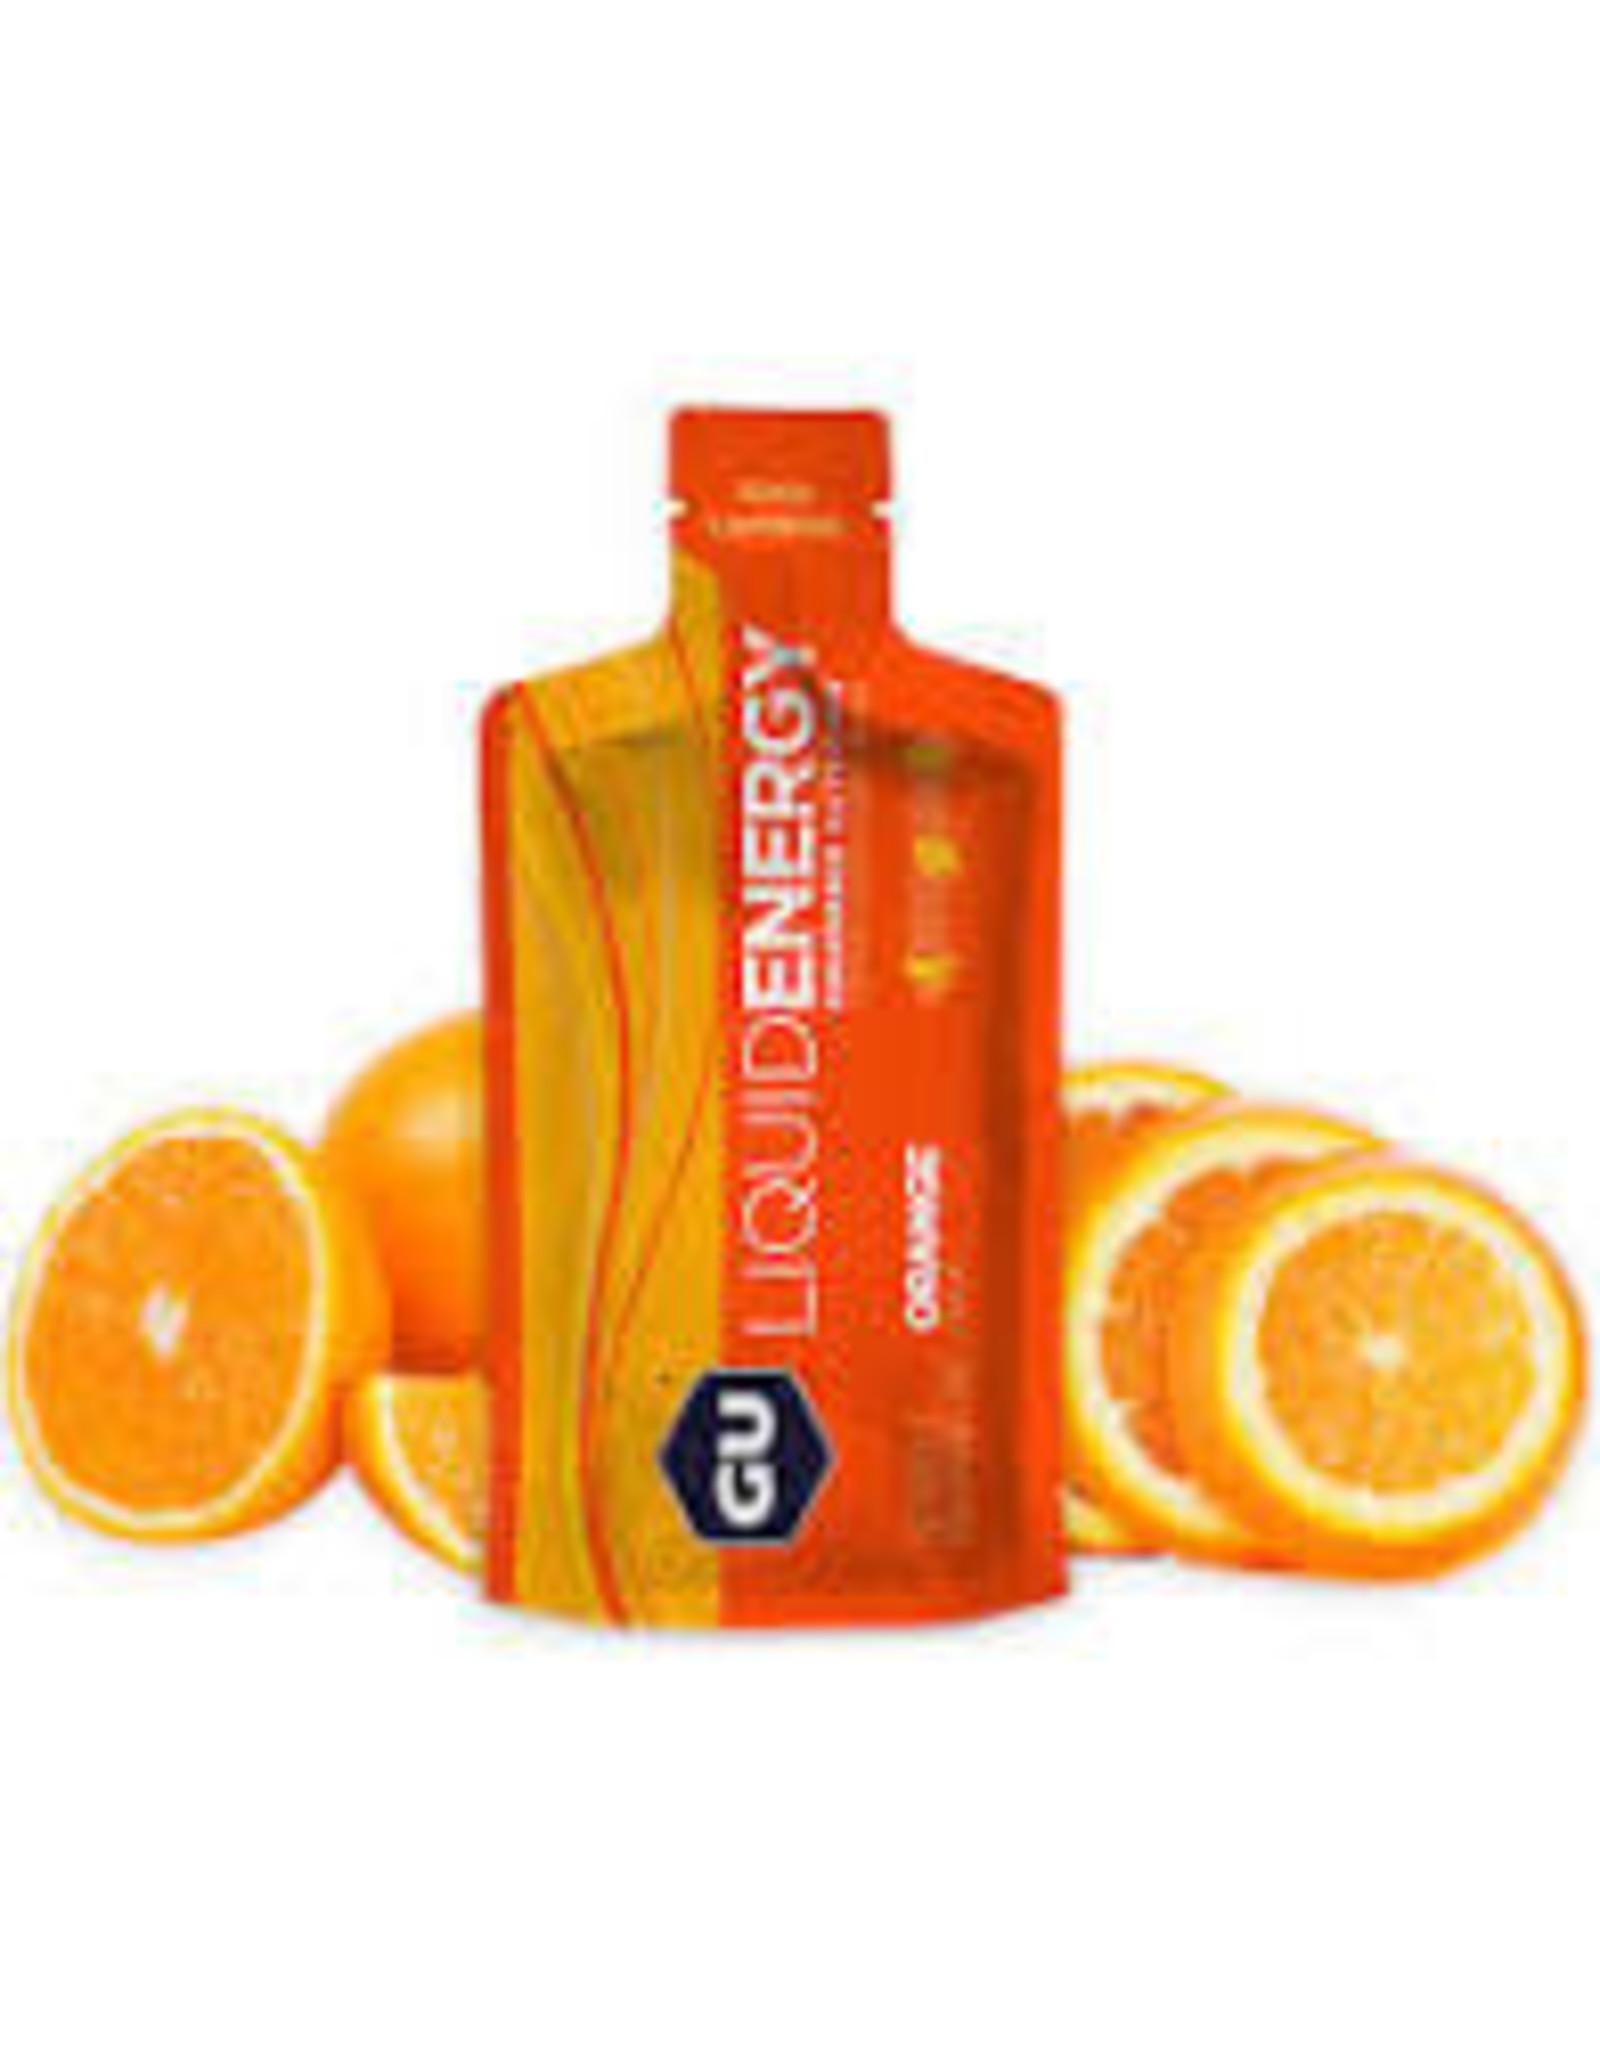 GU Energy Labs GU Liquid Energy Orange Box of 12 single